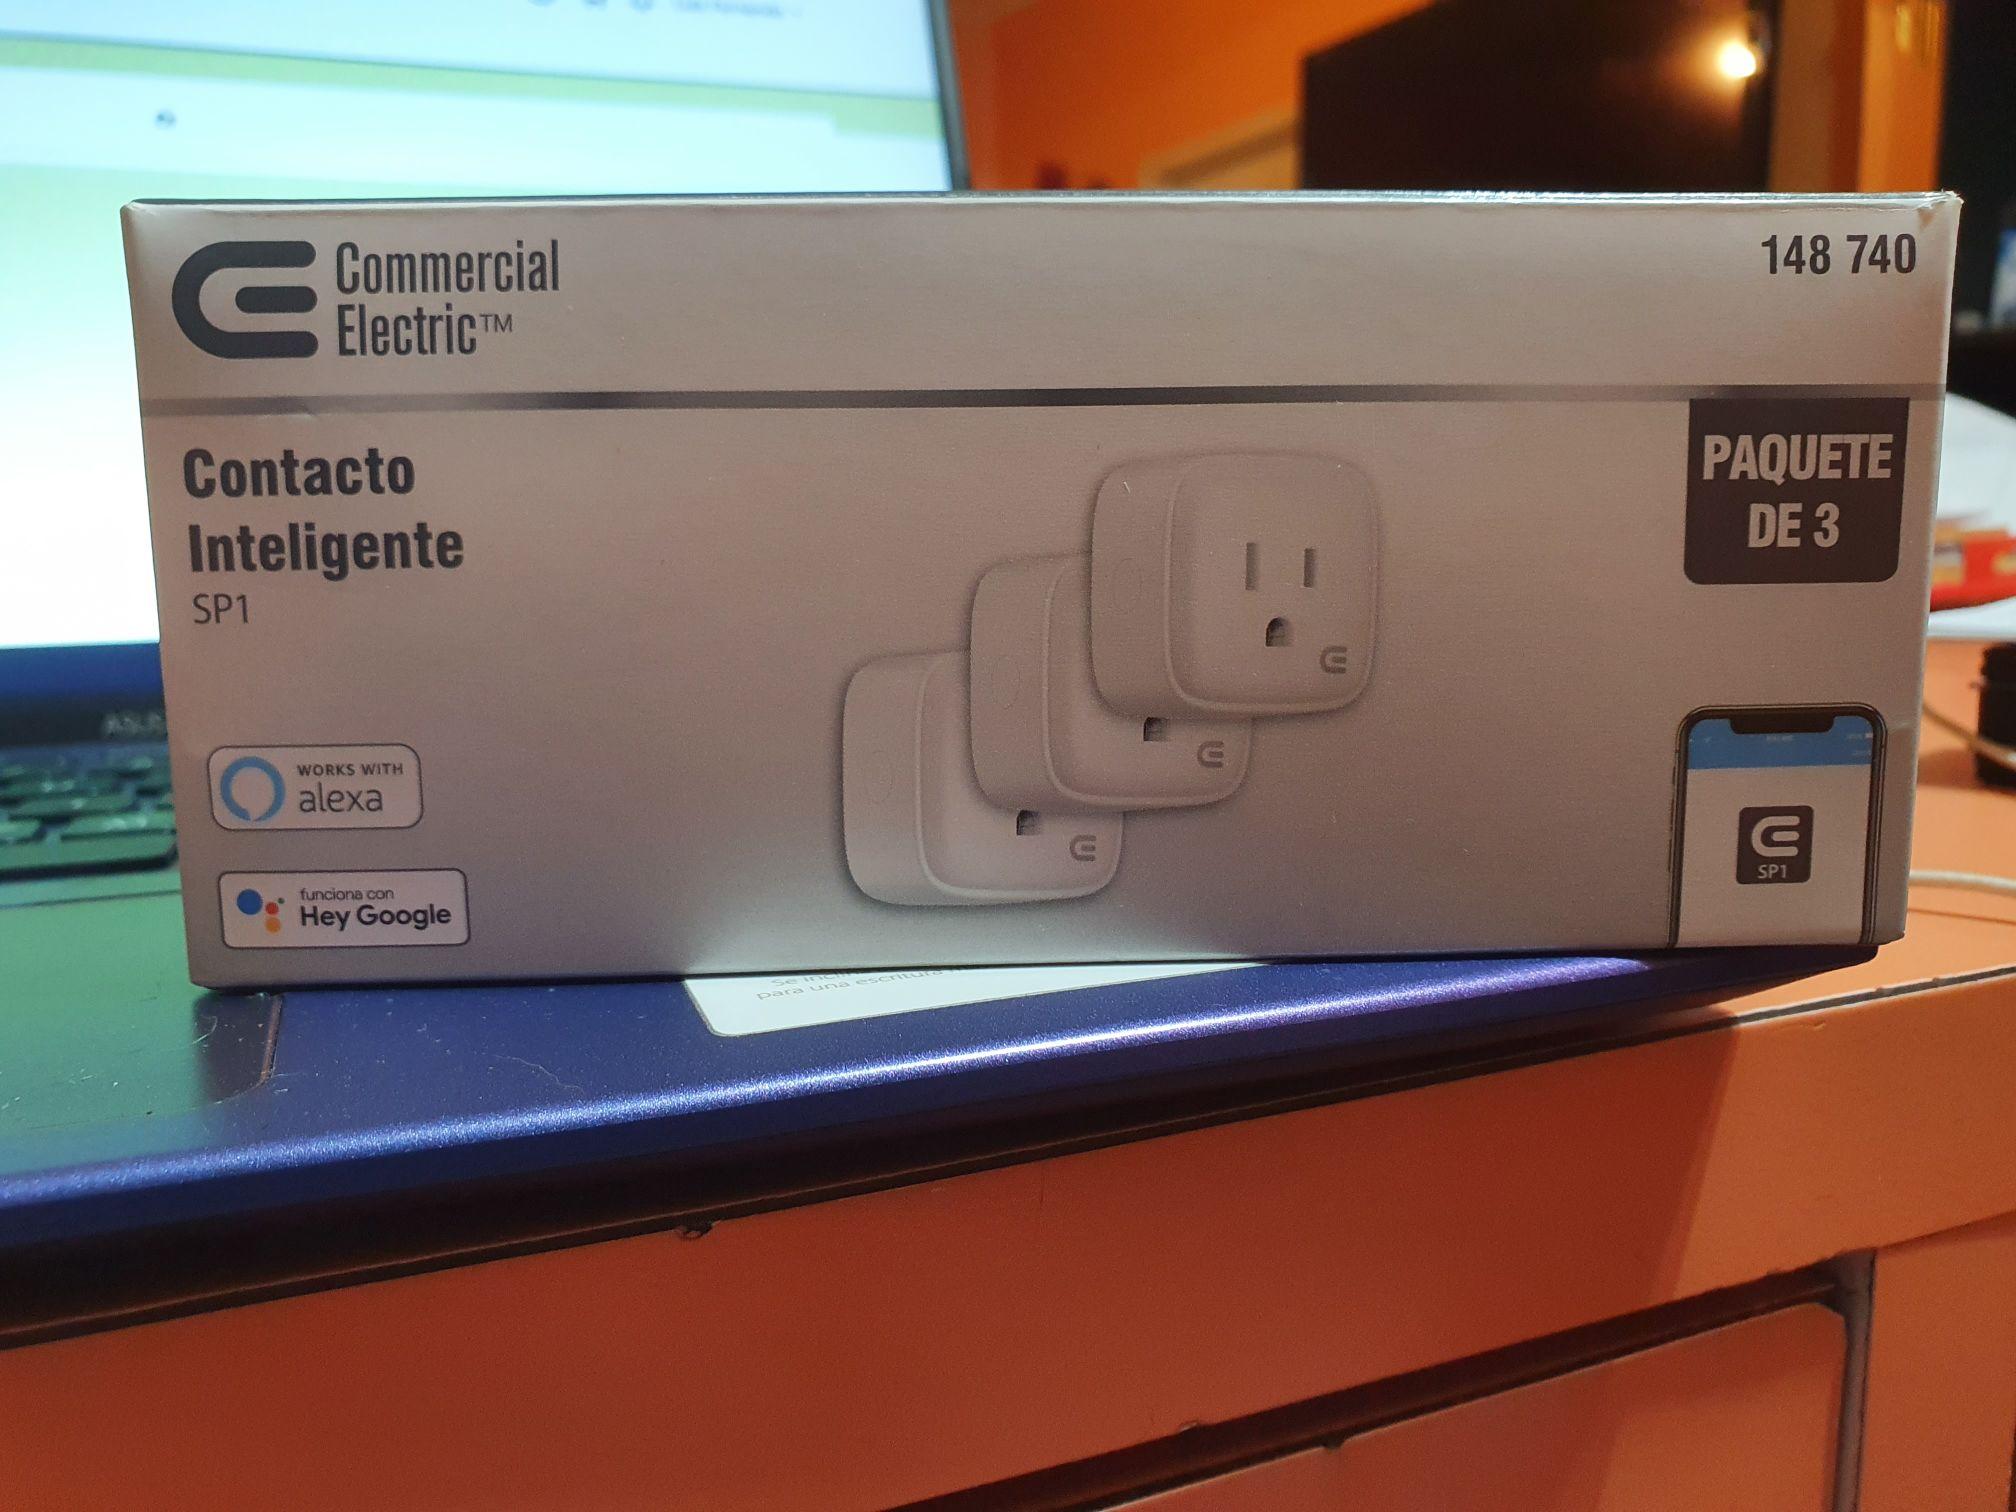 Home Depot: Contacto Inteligente 3 Pack